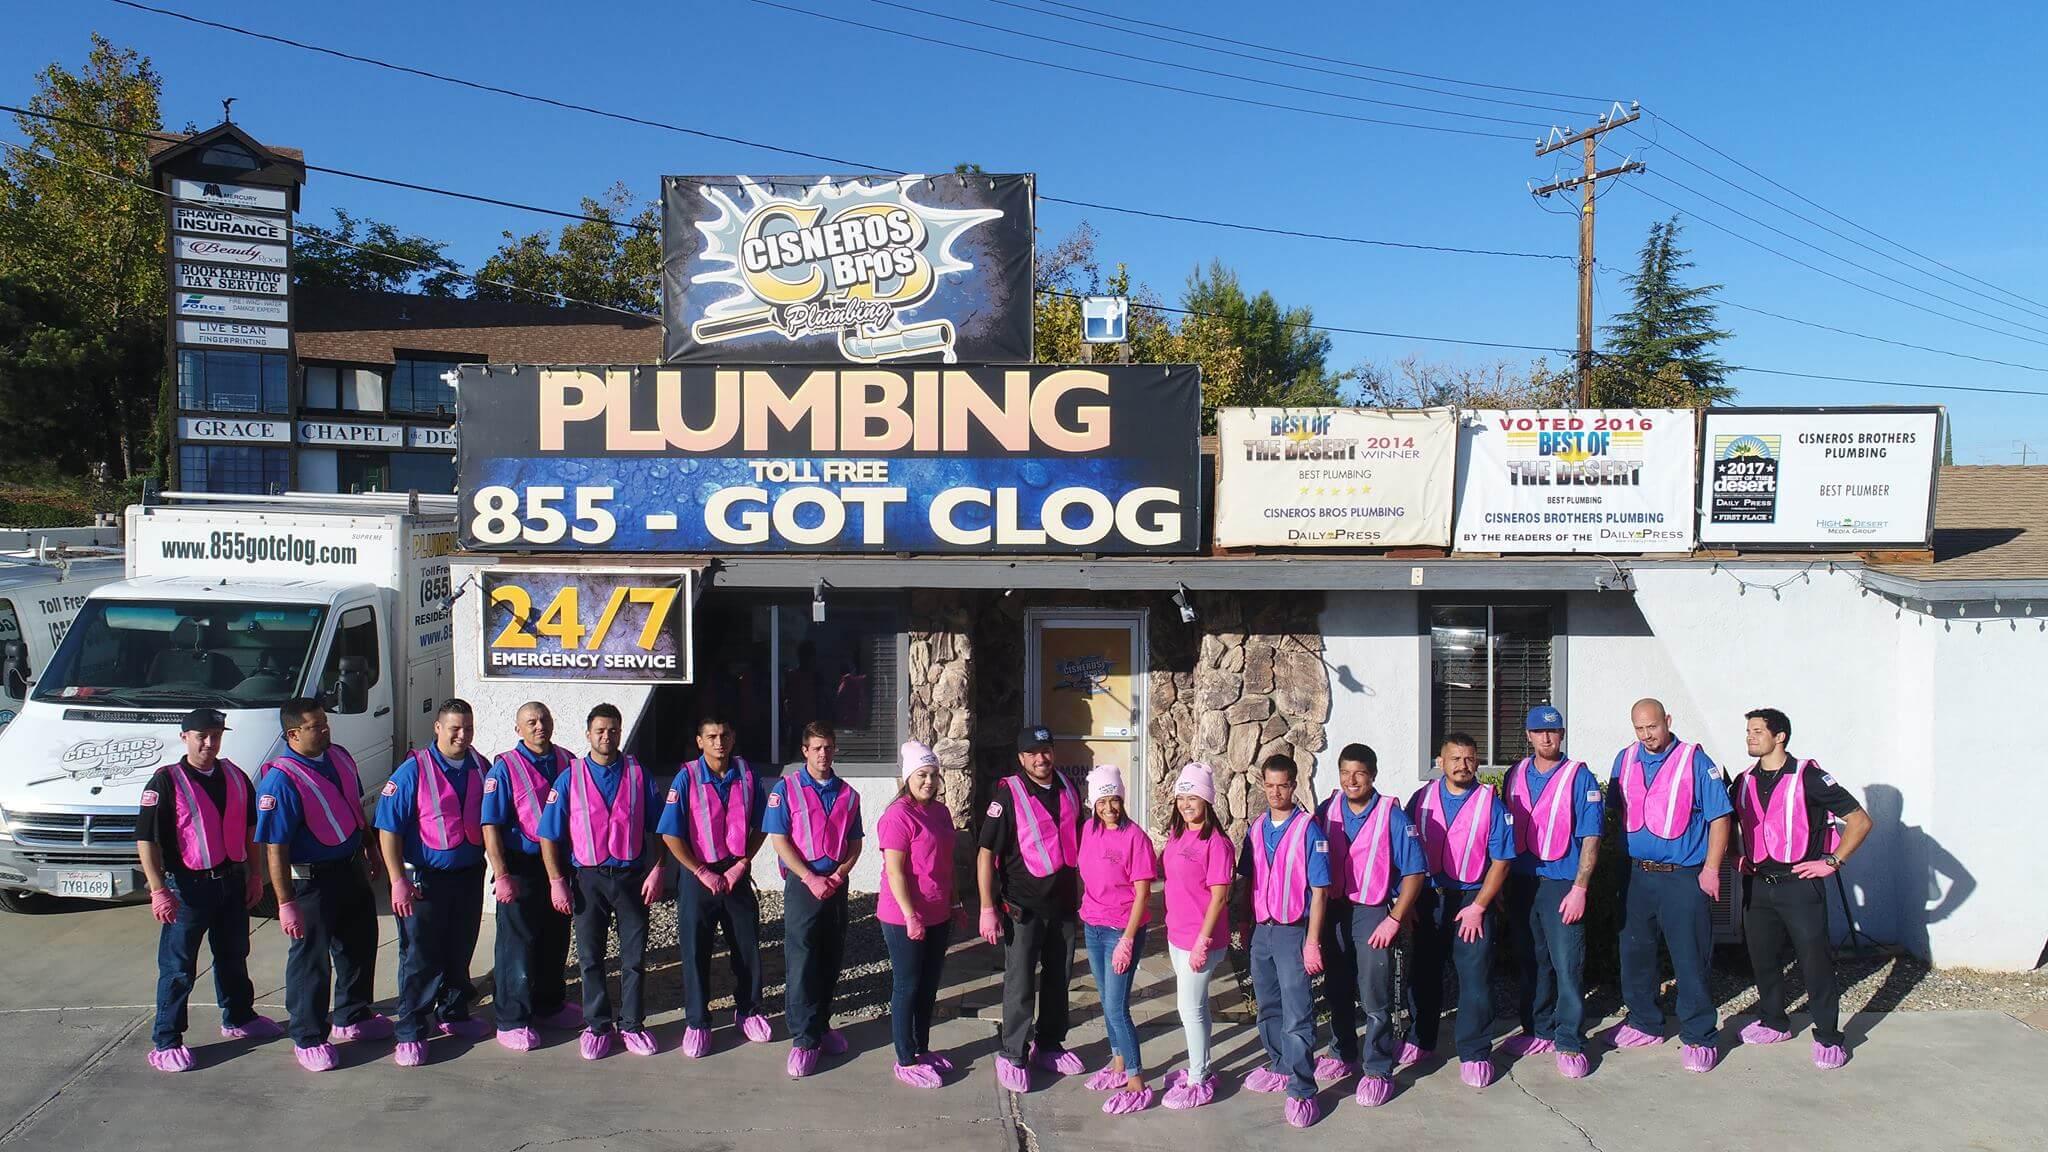 Contact-Cisneros-Brothers-Plumbing